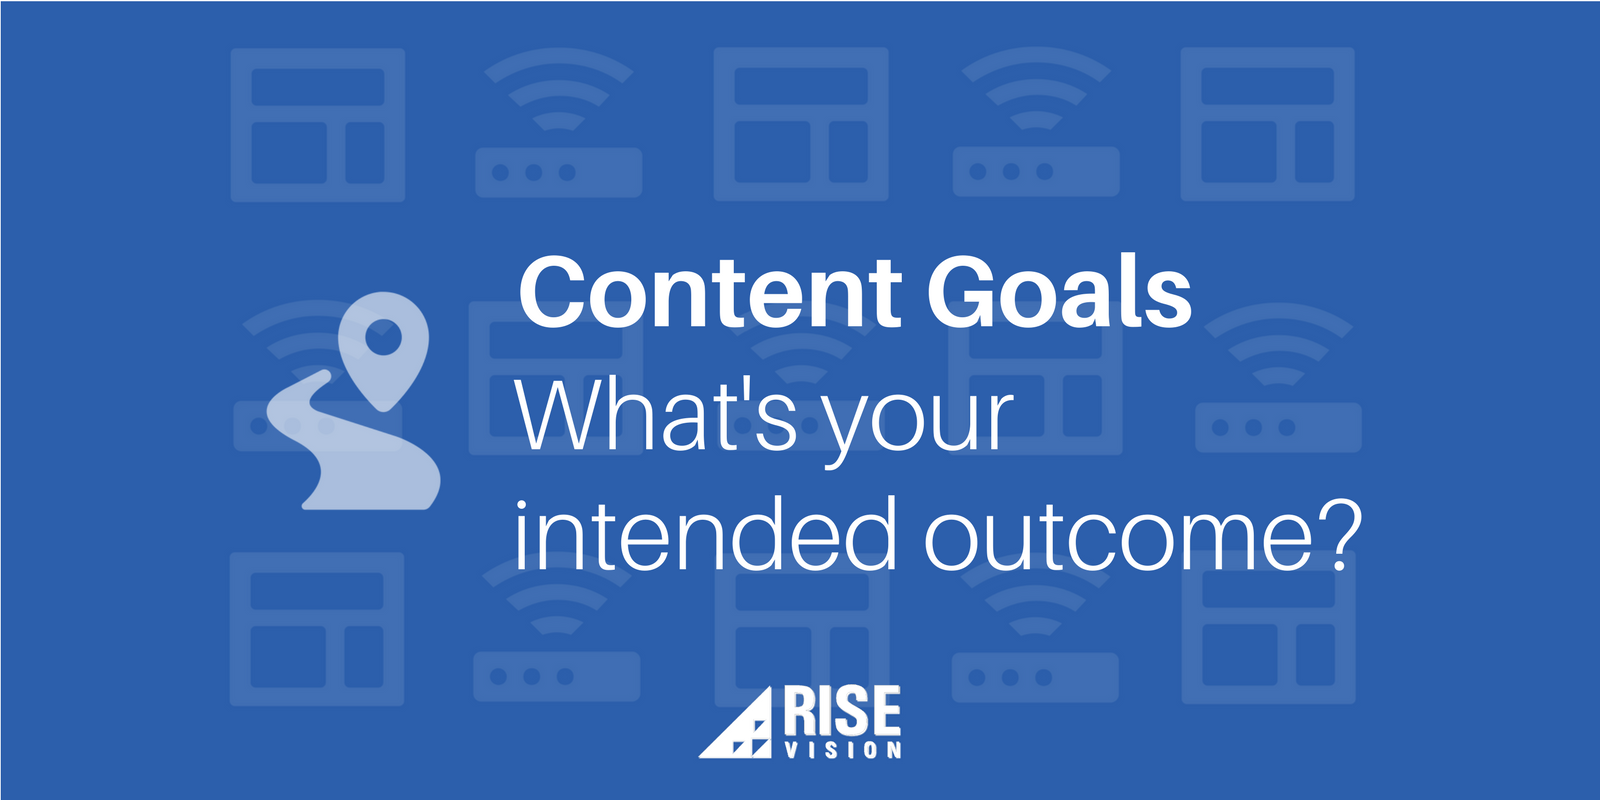 Rise Vision Digital Signage Content Goals.png